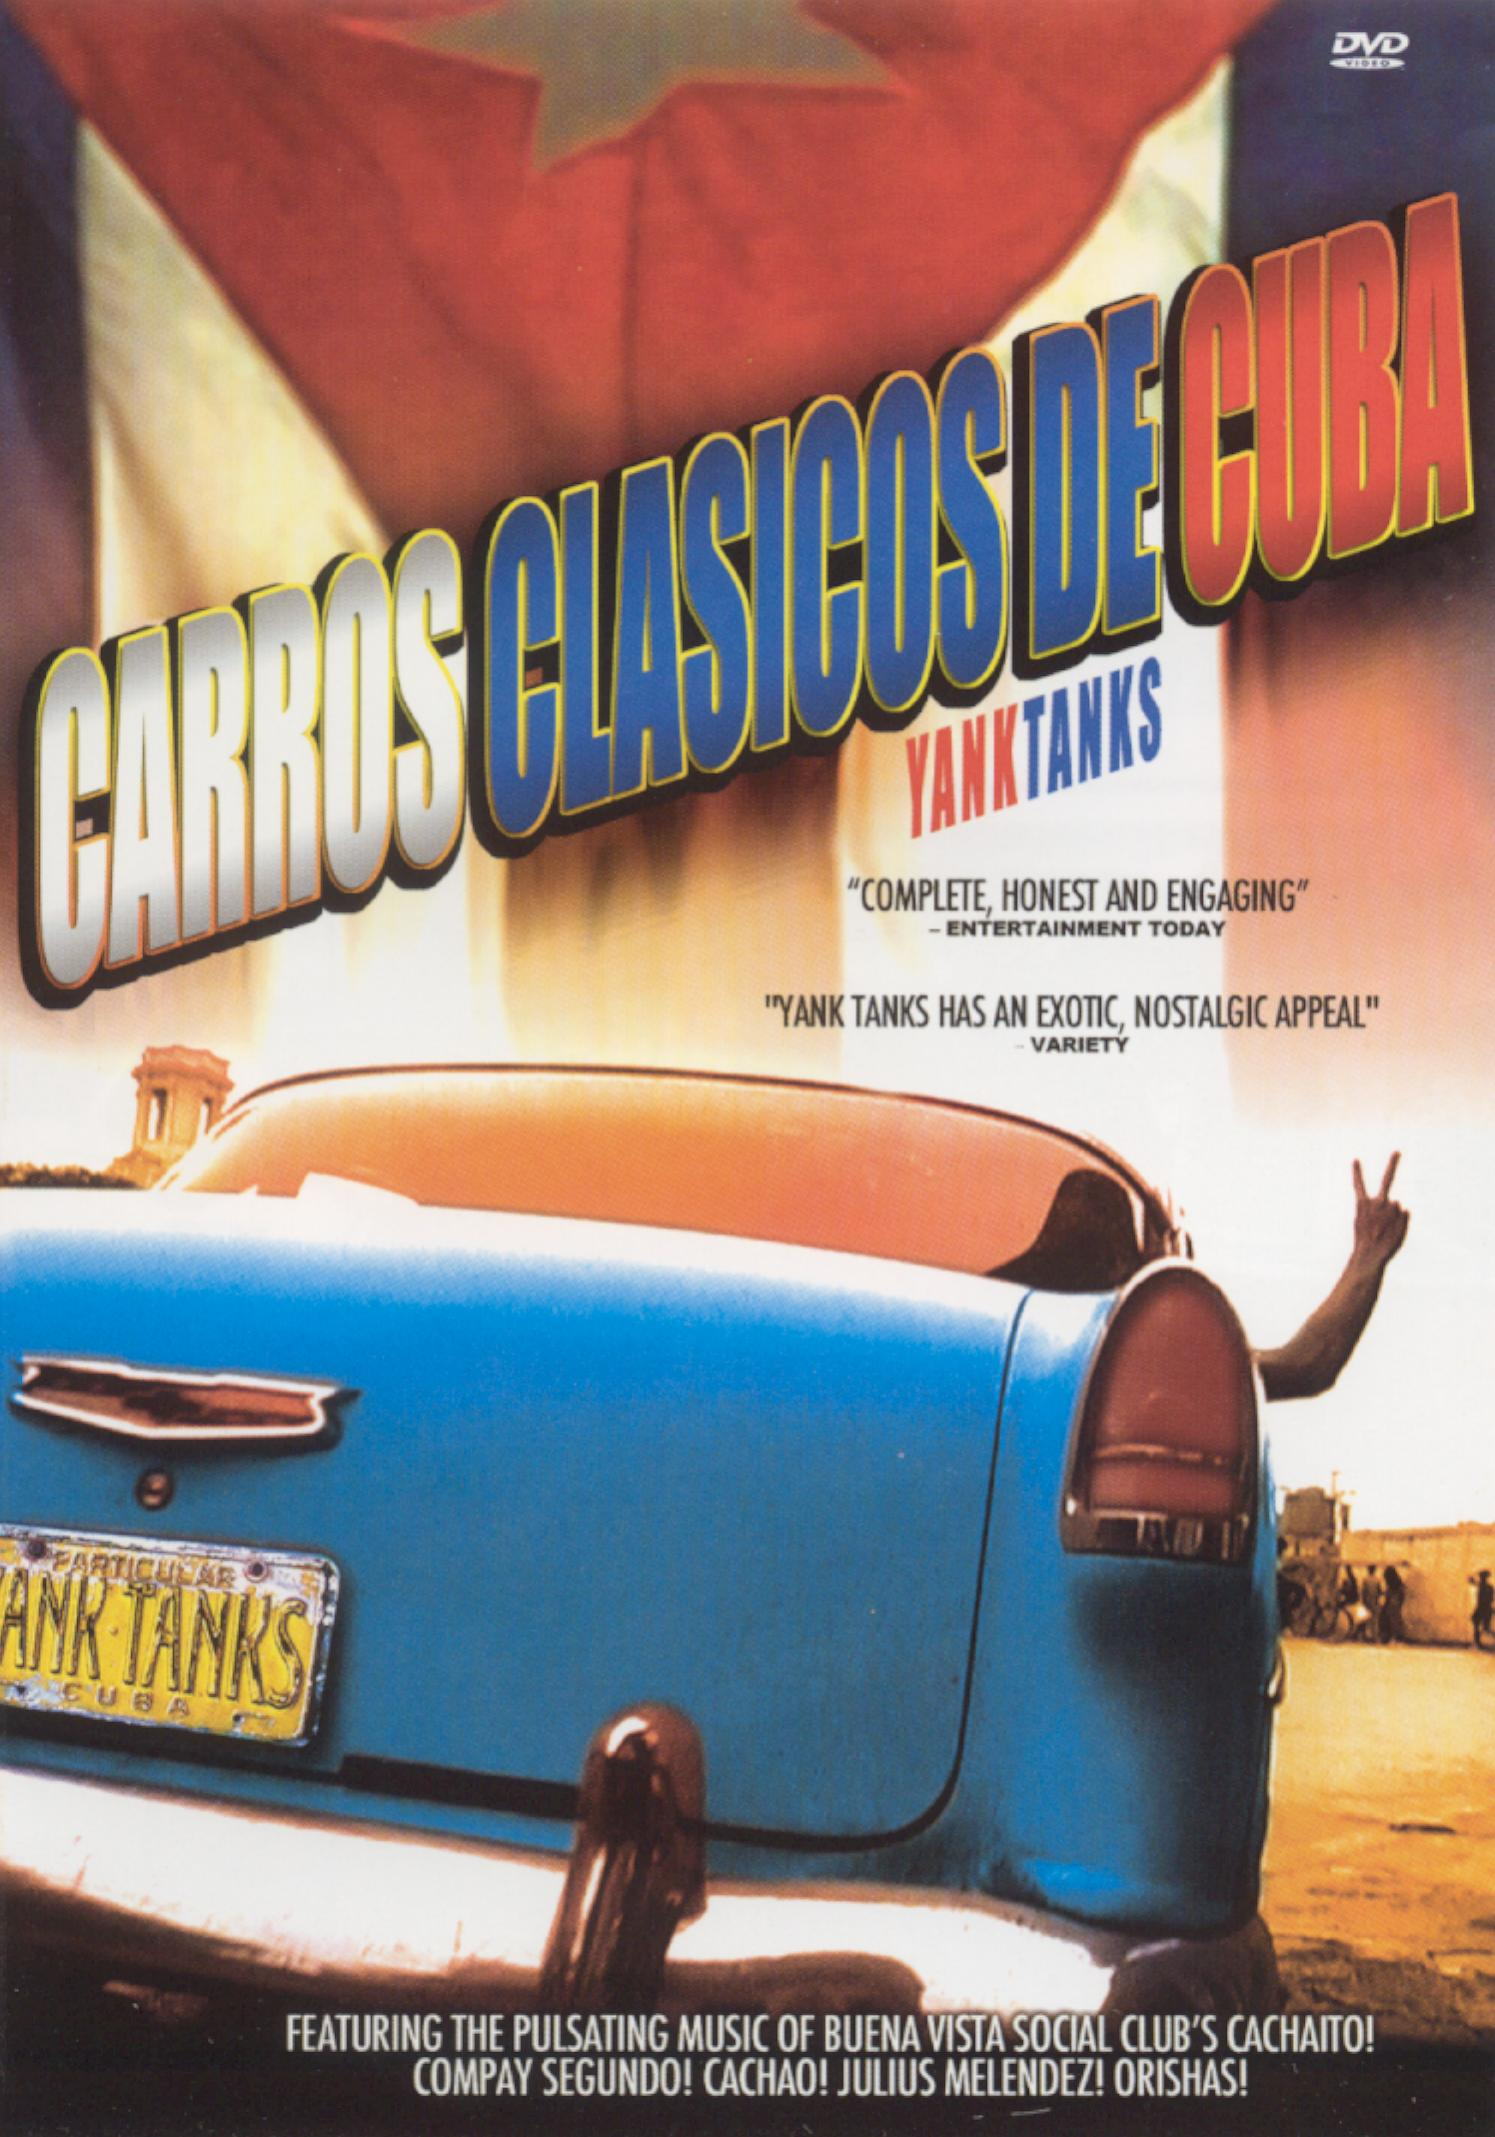 Carros Classicos De Cuba